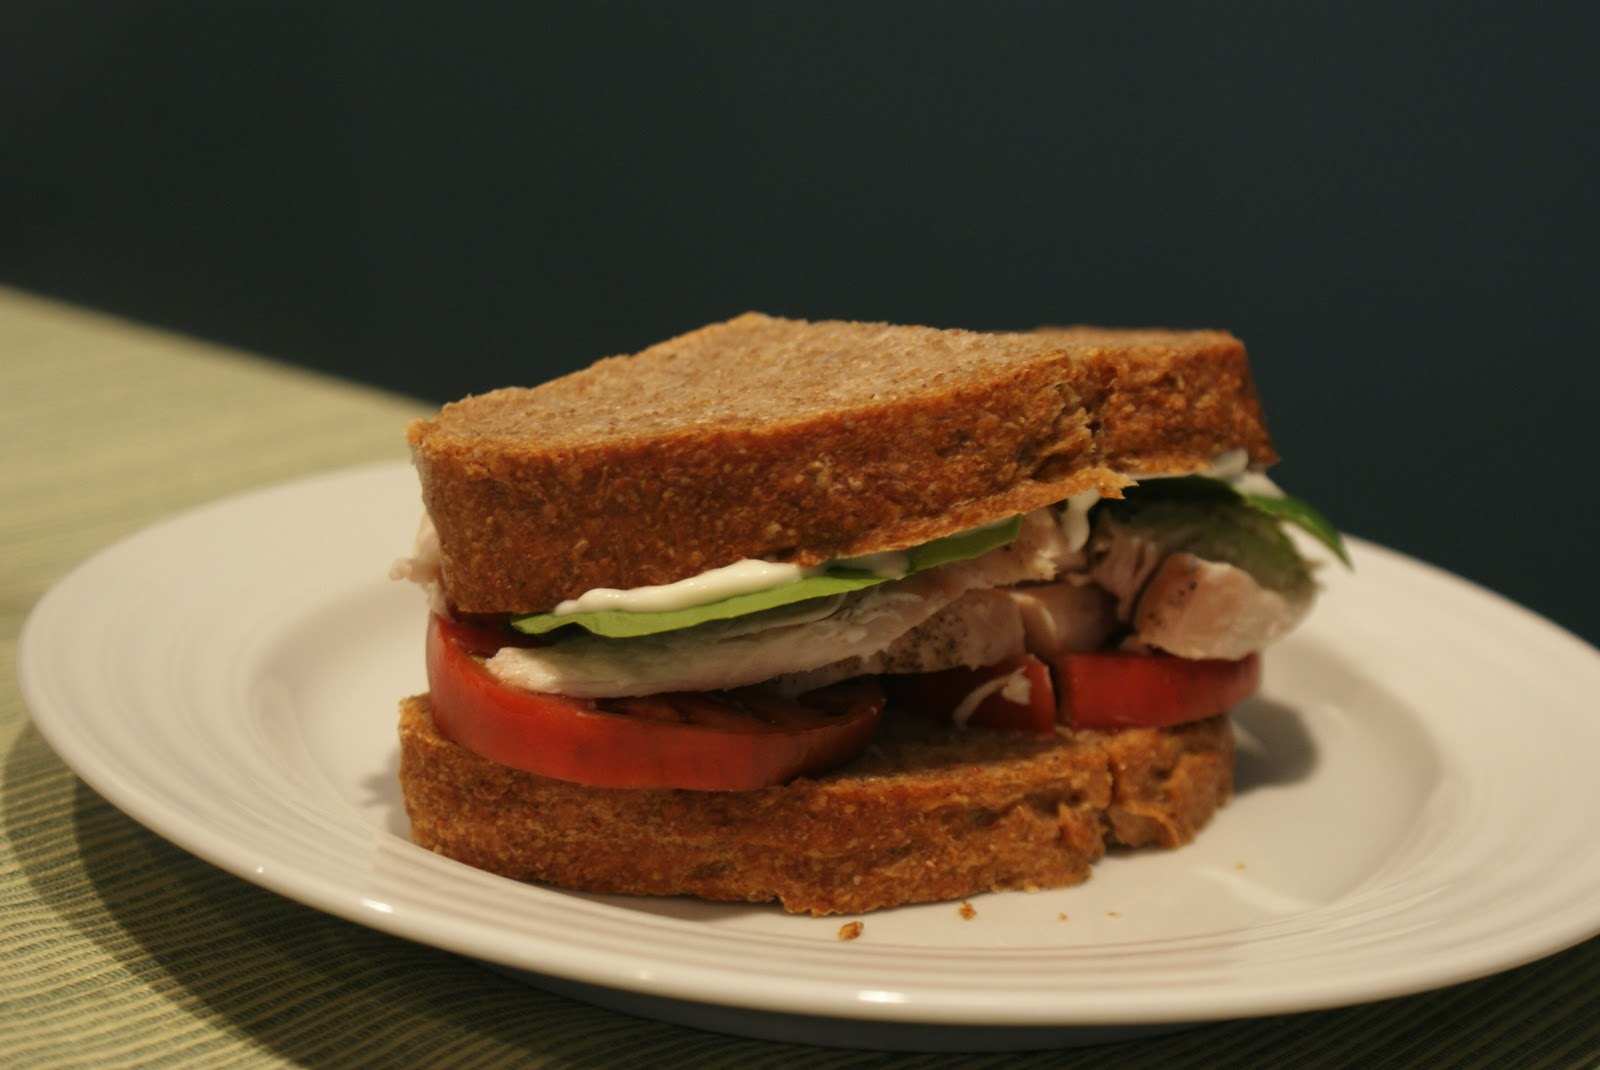 Piccante Dolce: Unprocessed: Homemade Roast Turkey Sandwich